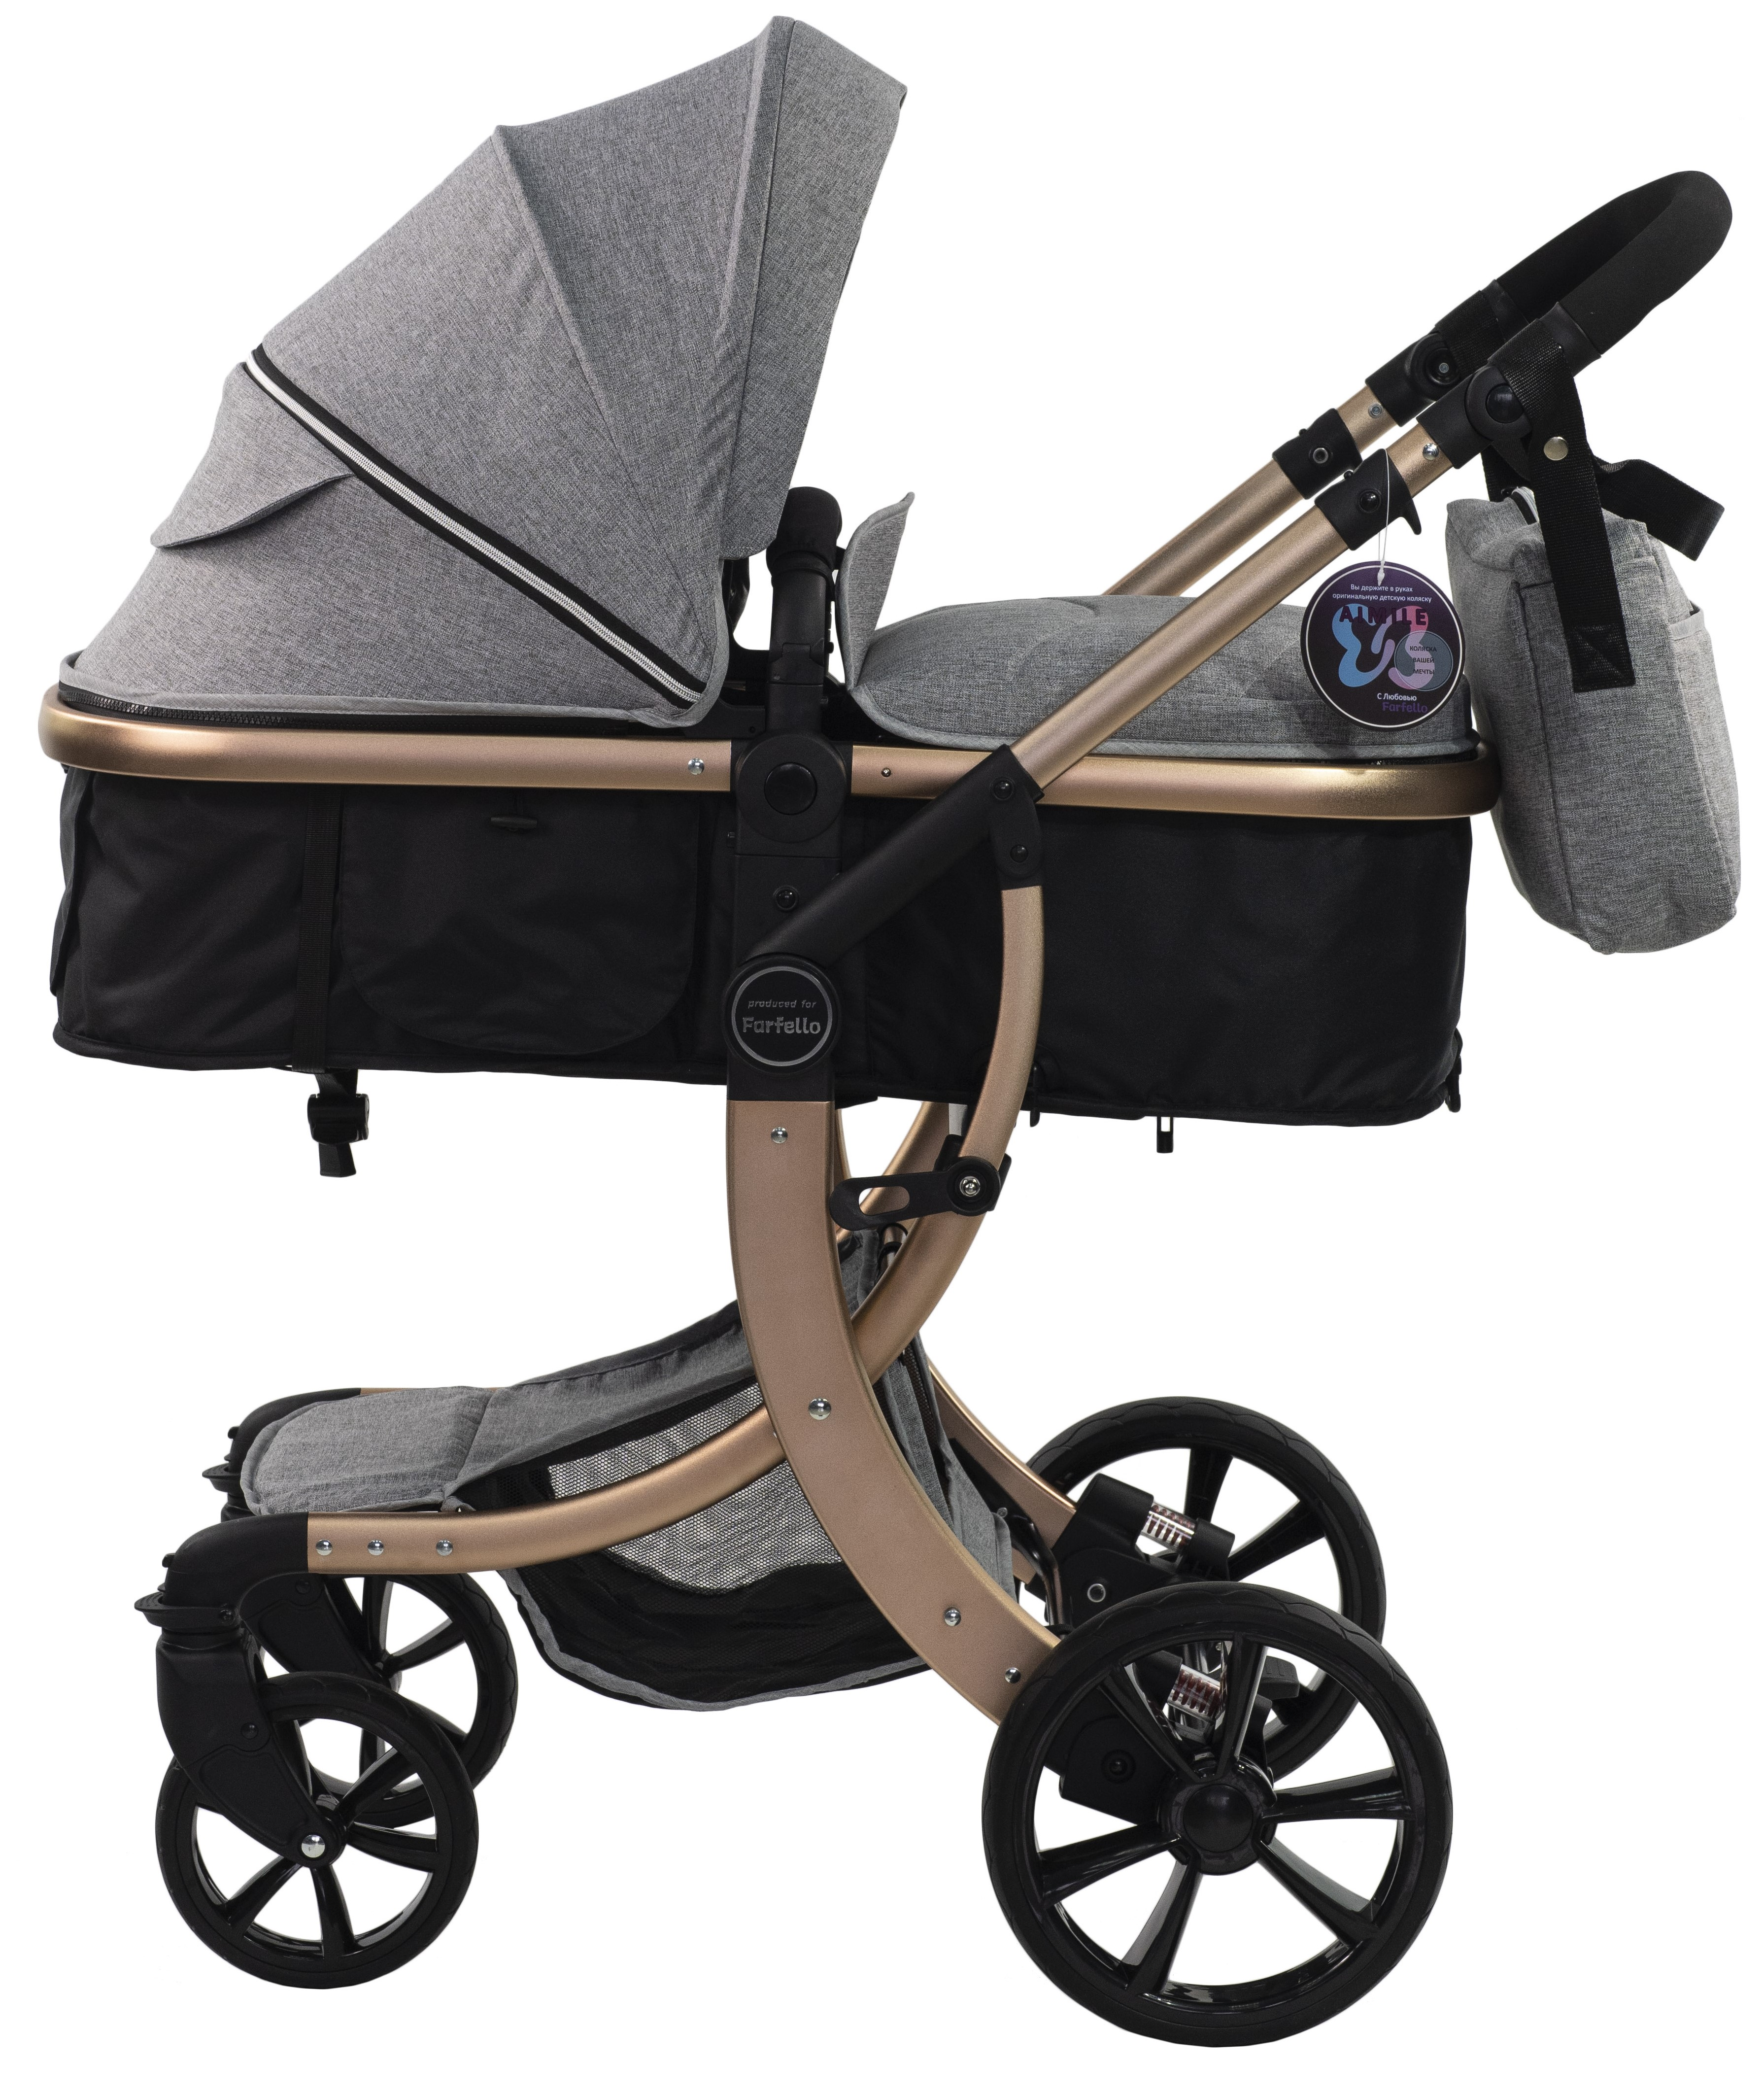 Купить Коляска трансформер Aimile Gold, ТM Farfello, серый, FTG-2, Детские коляски трансформеры